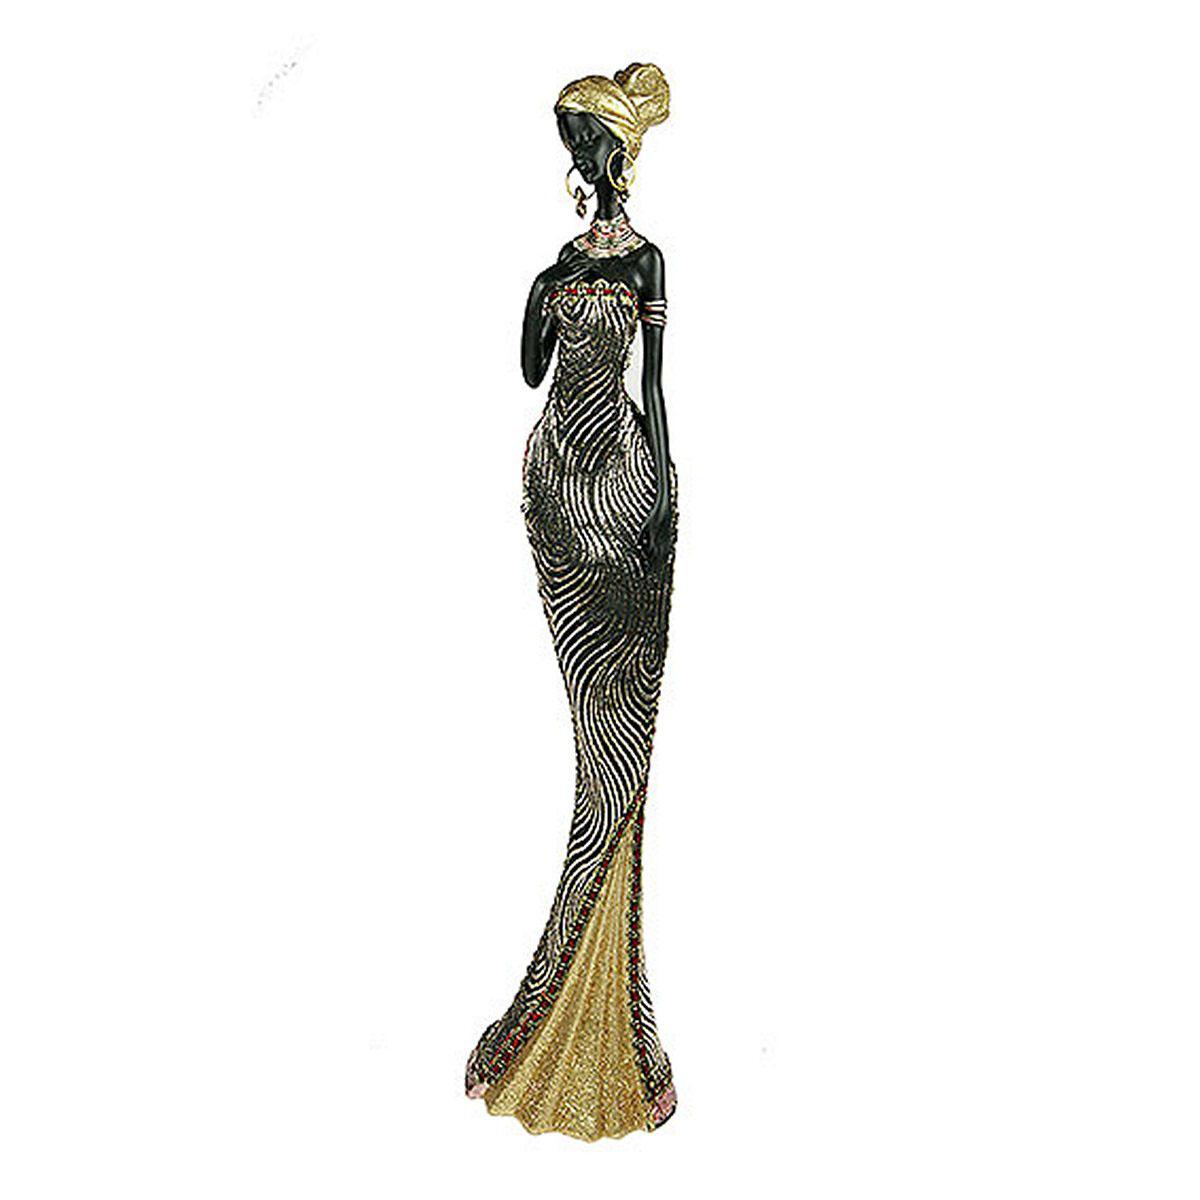 Статуэтка Русские Подарки Африканка, 10 х 12 х 43 см статуэтка русские подарки африканка 11 х 15 х 24 см